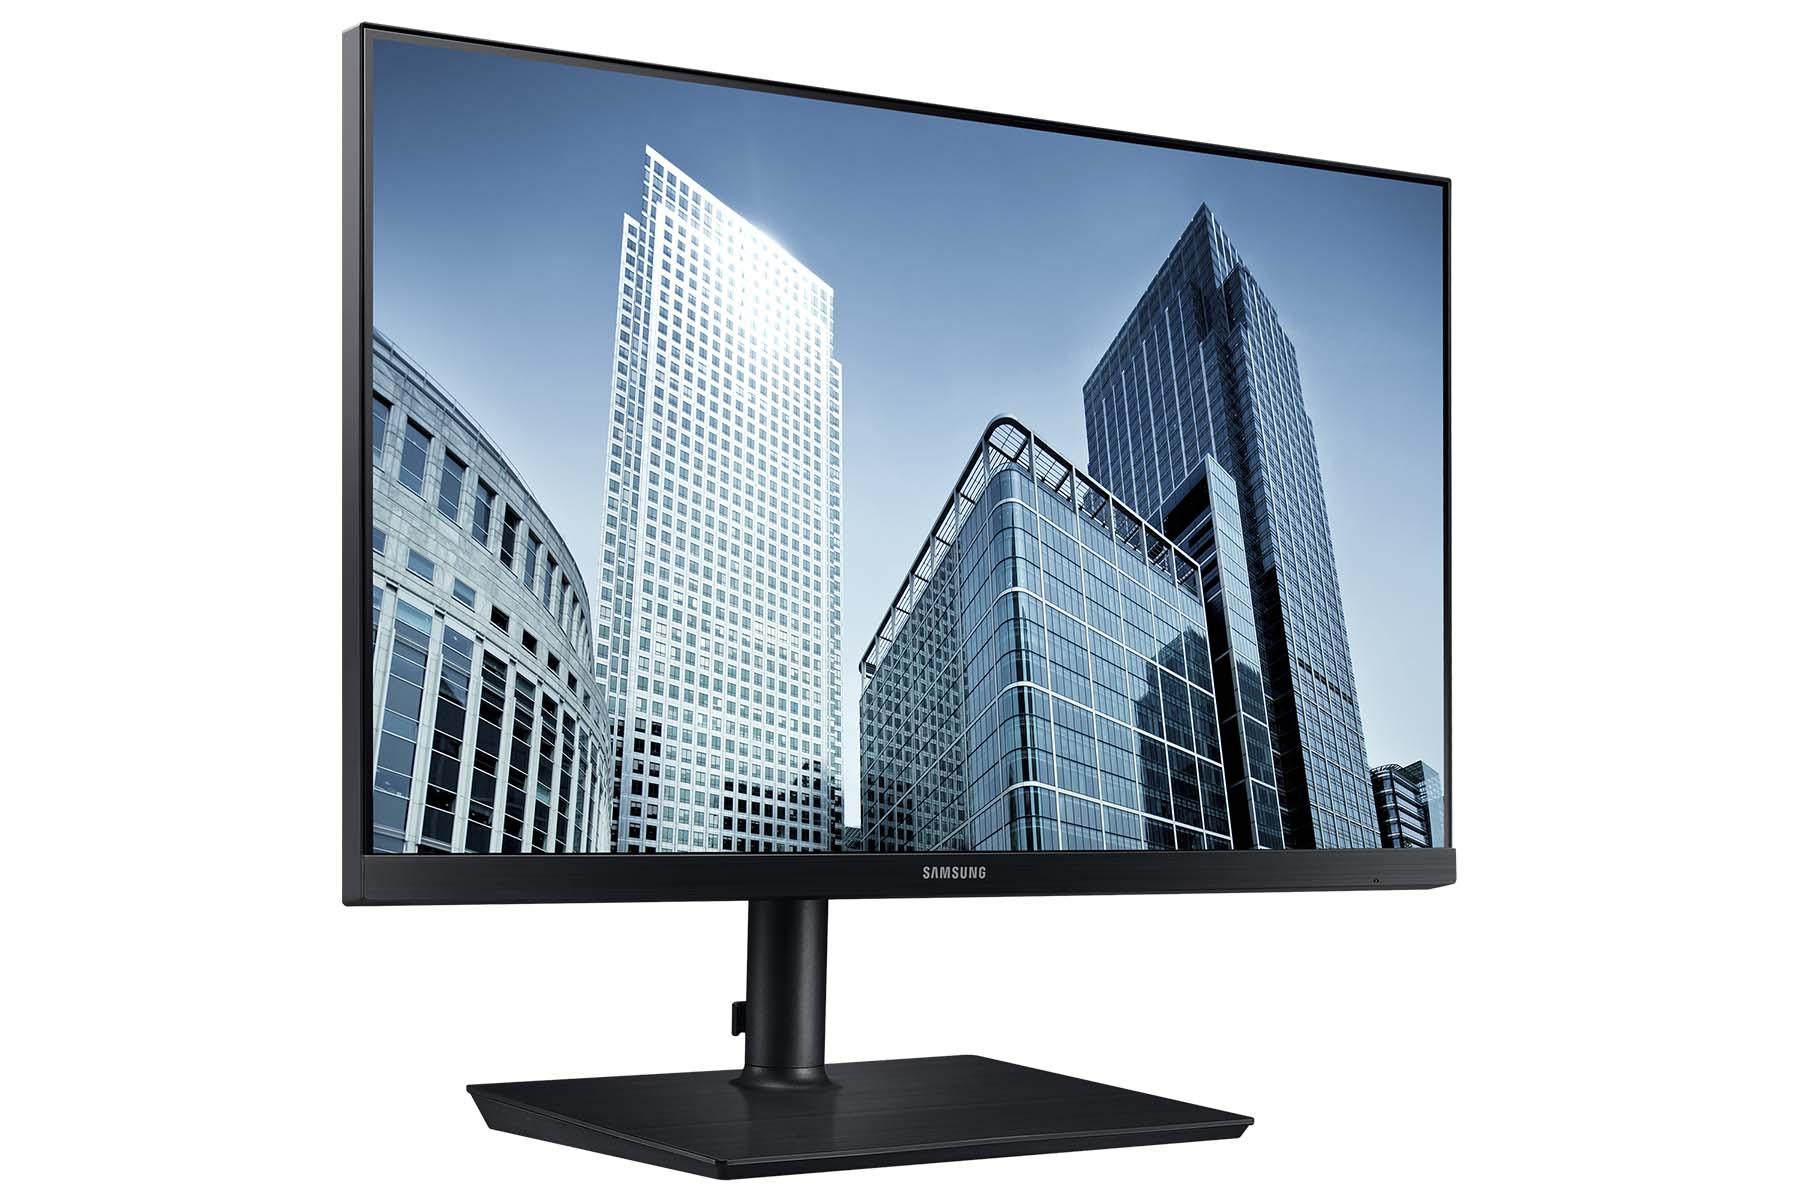 "Samsung LED LCD 24"" S24H850 16:9 PLS/2560x1440/5ms/300 cd/m2/HDMI/DP/USB-C/USB Hub"